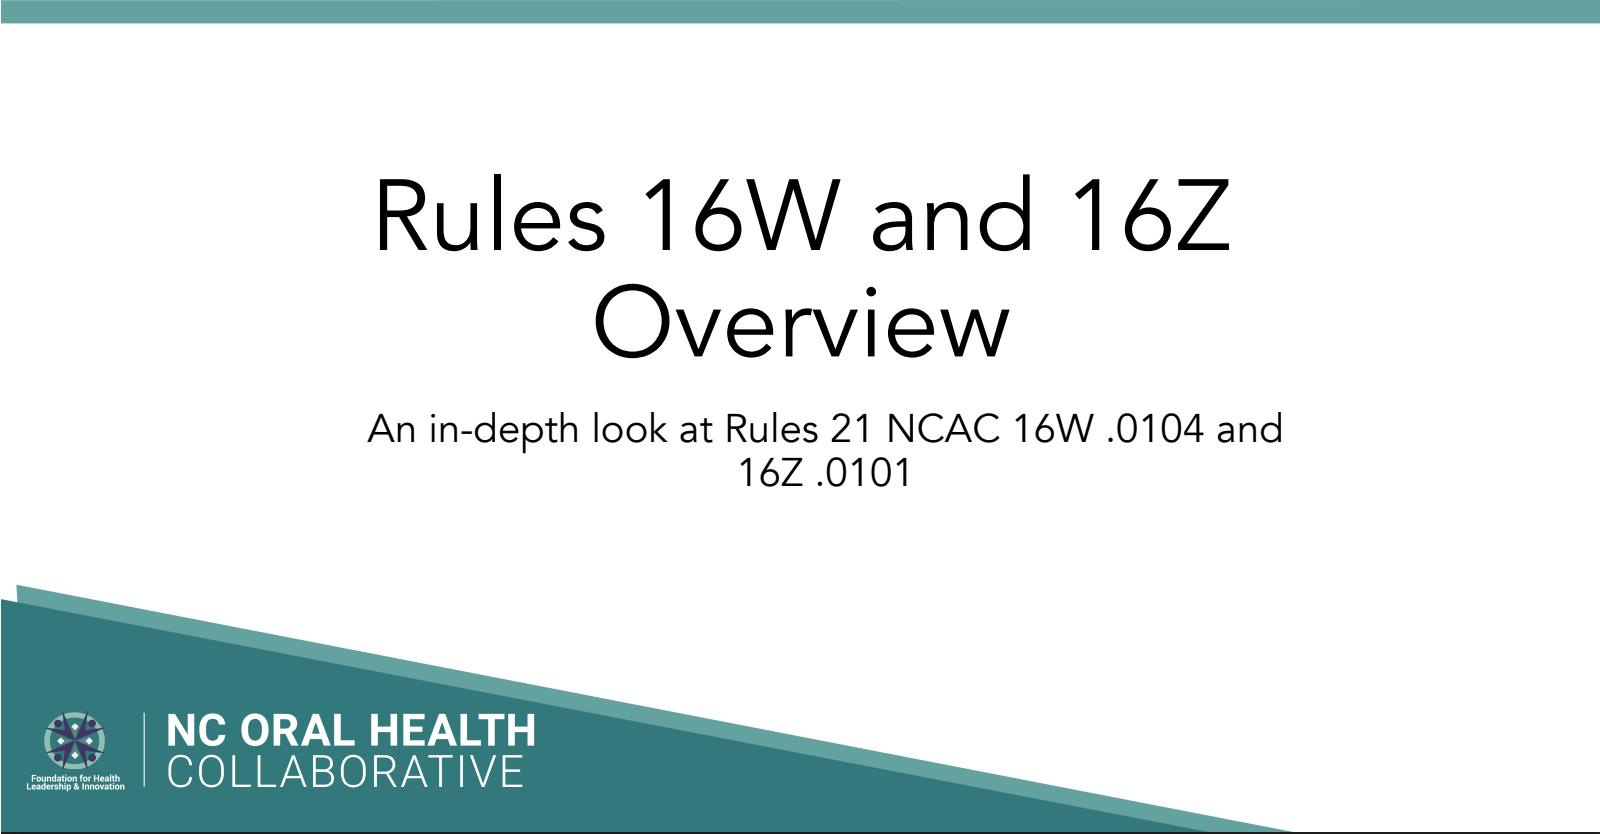 Webinar Slides: Rules 16W and 16Z